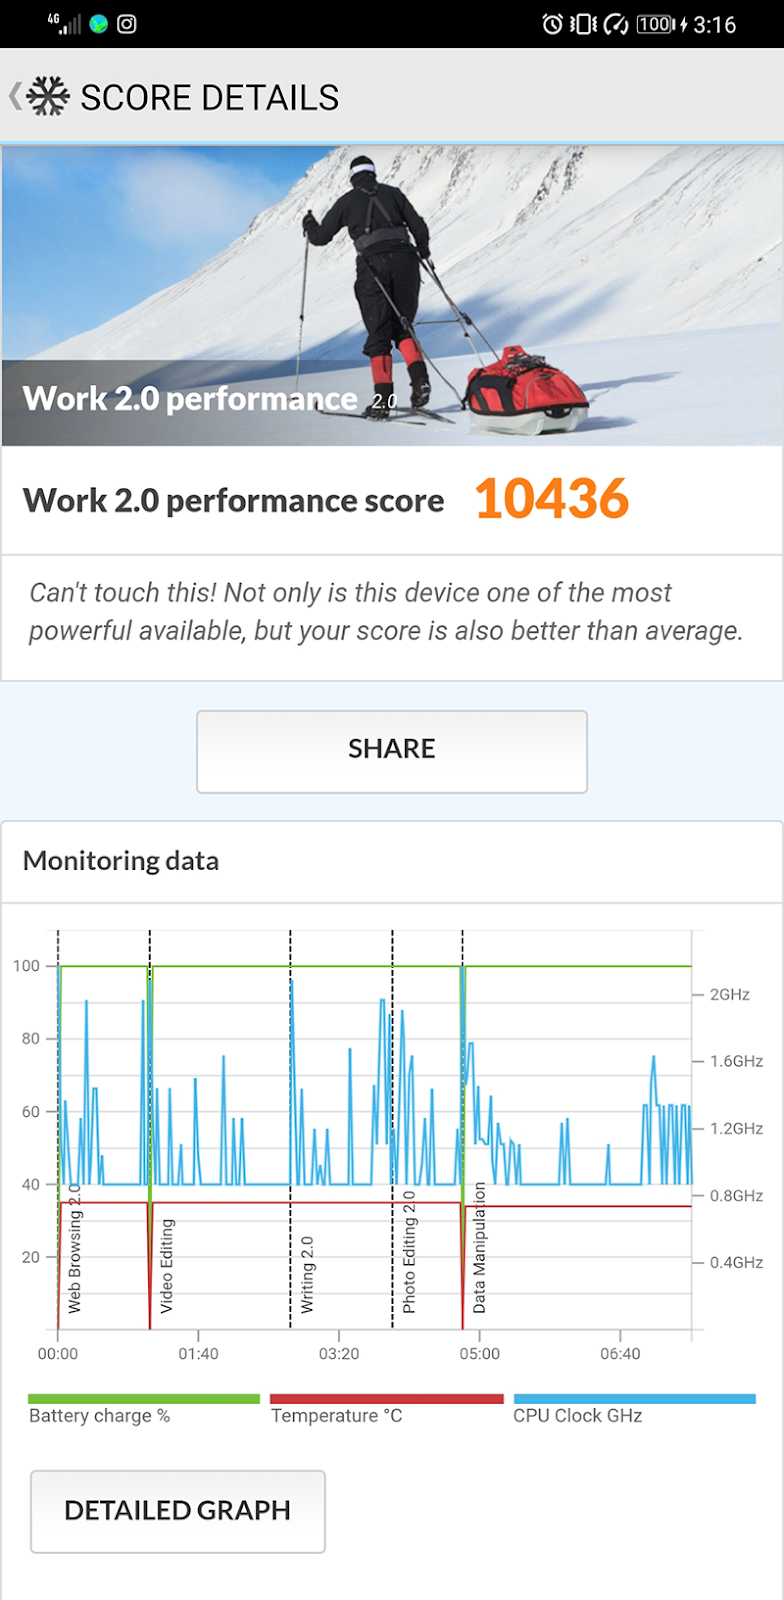 PCMark Work 2.0 performance